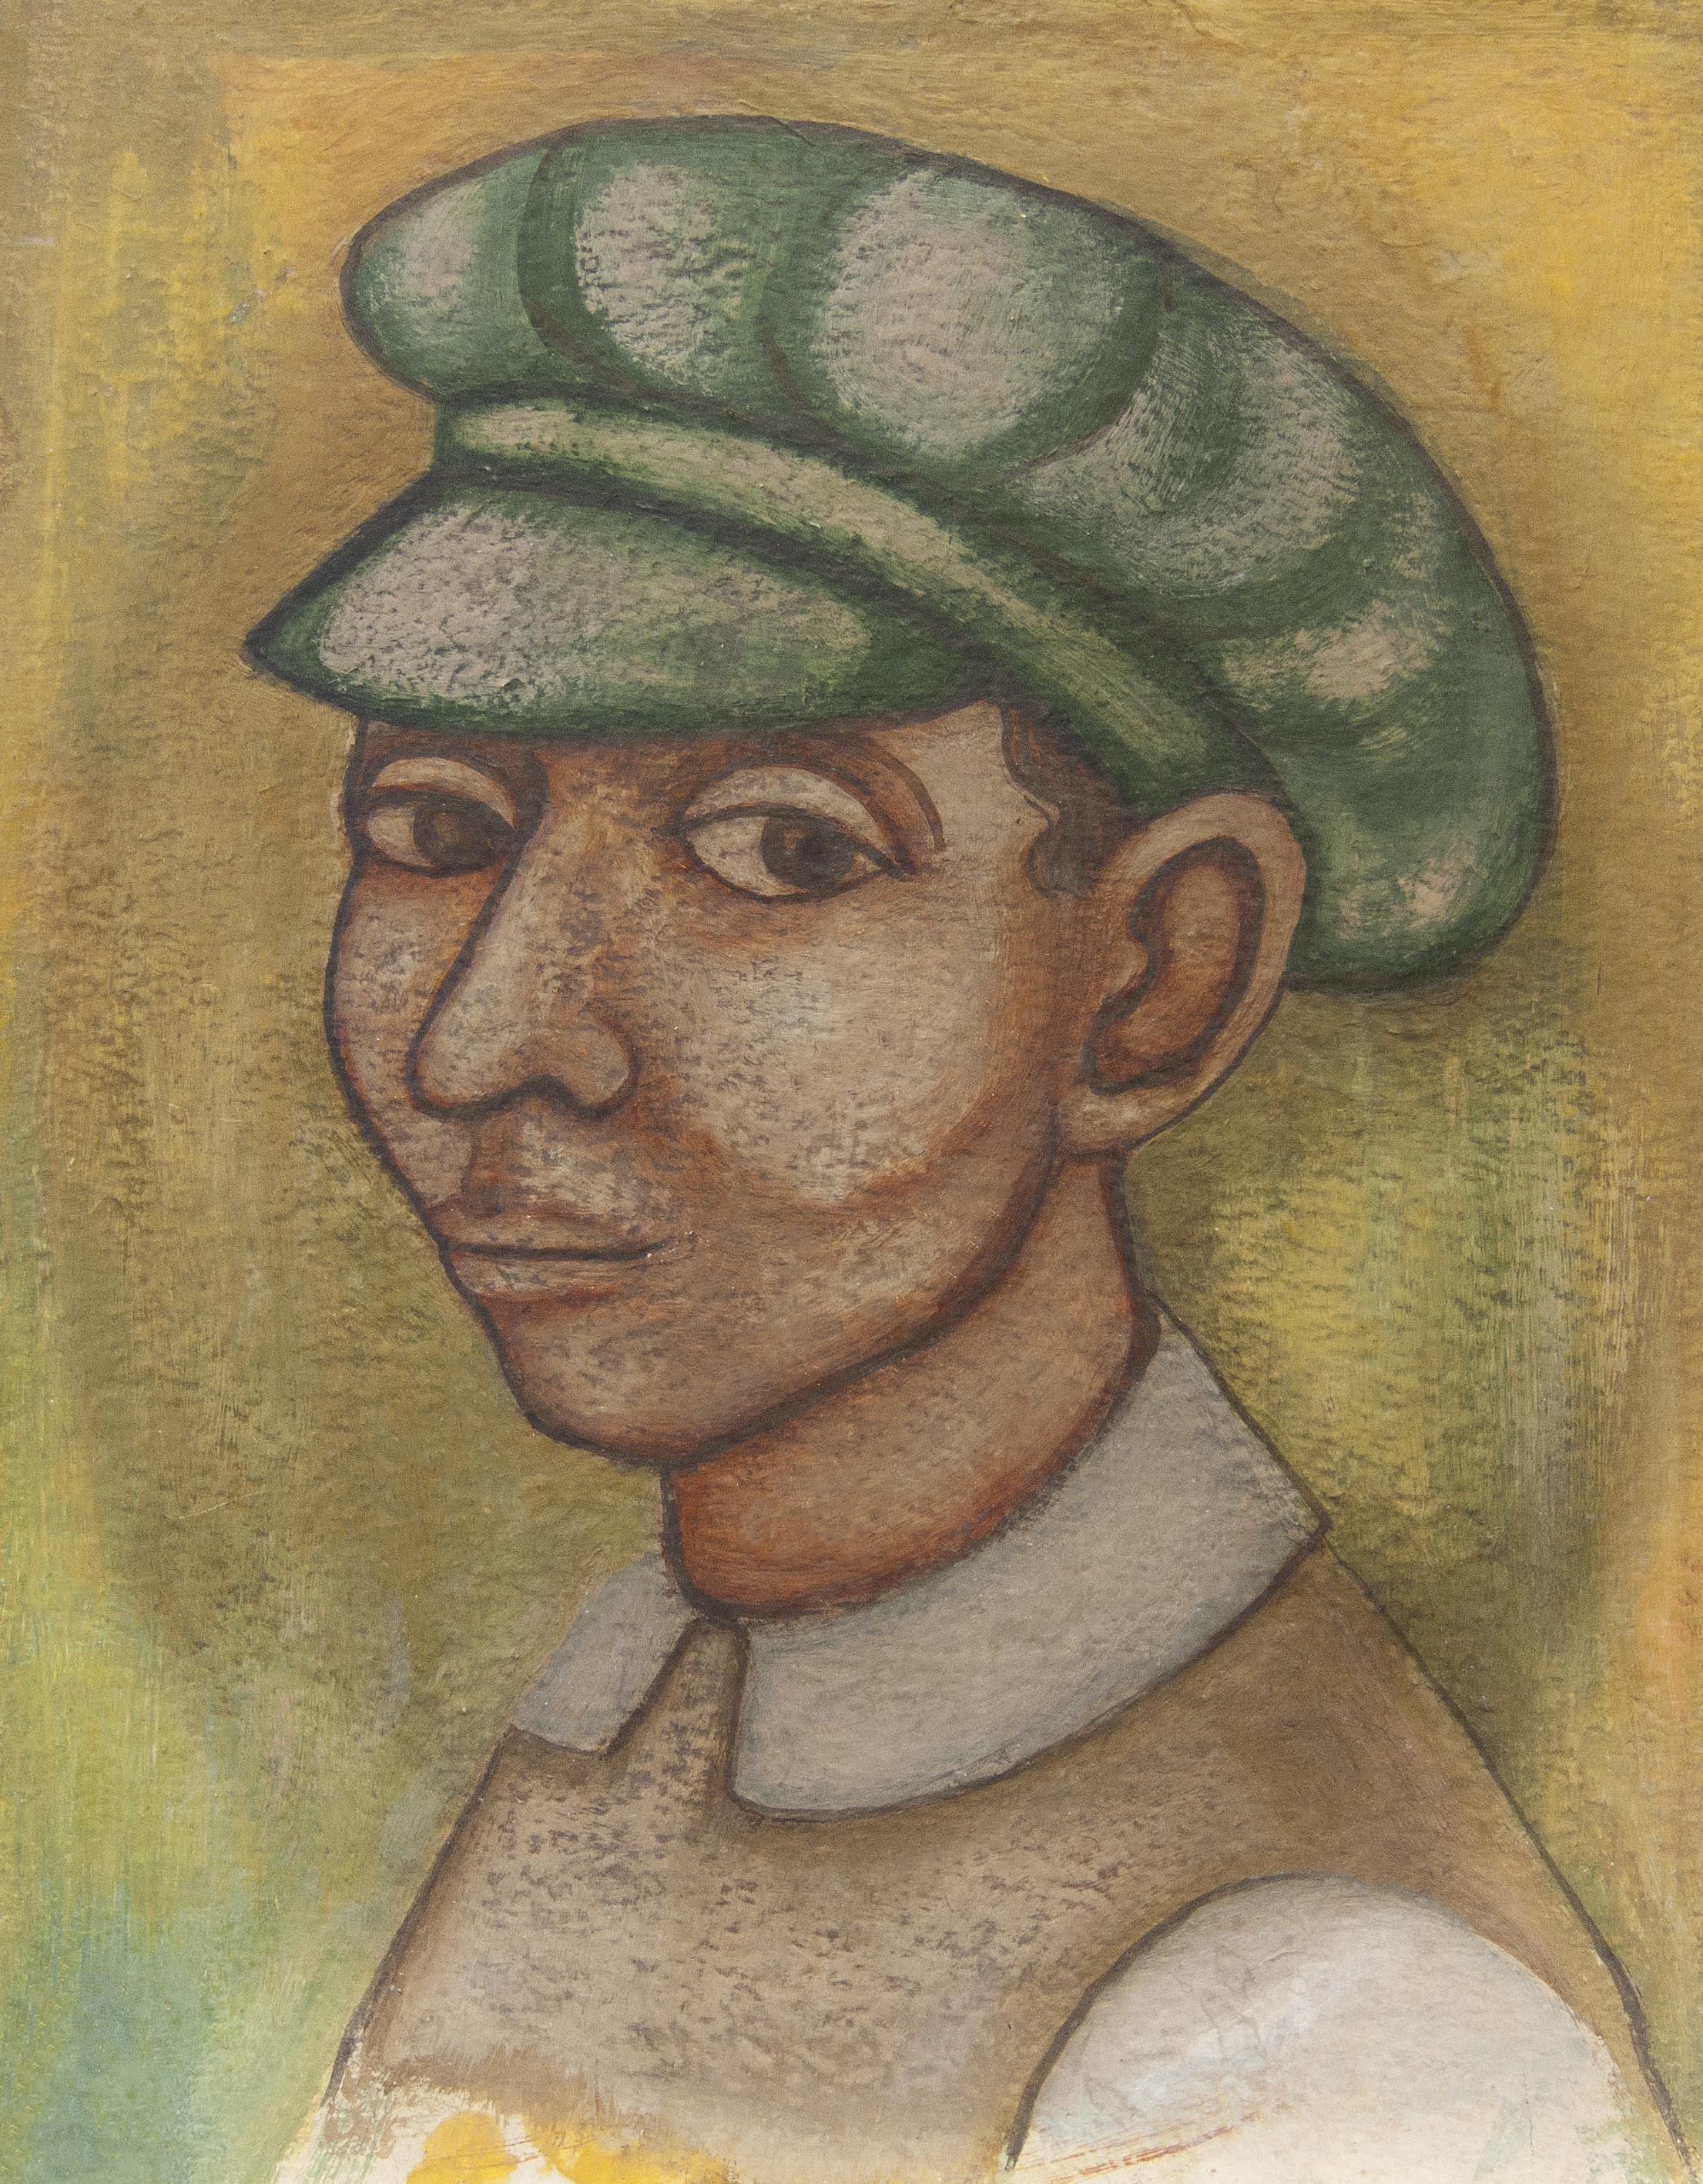 Untitled (Man in a Green Cap)